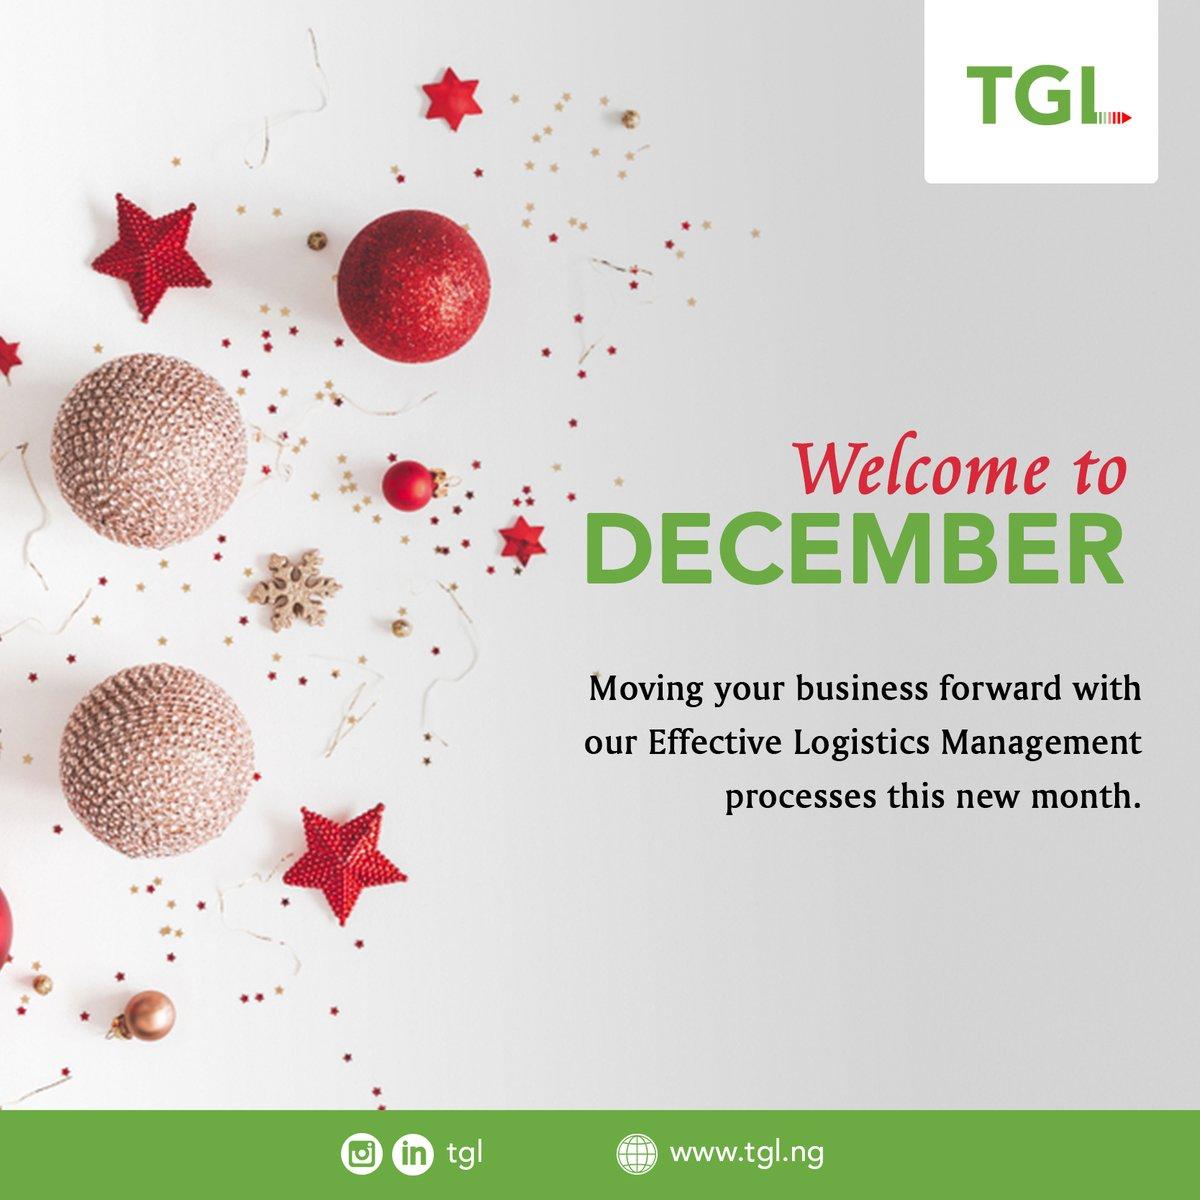 Happy New Month!  #December2020 #December #December1st #newmonth #happynewmonth #newmonth #tuesdaymotivation #logistics #logisticservices https://t.co/sO8ceWVFzK